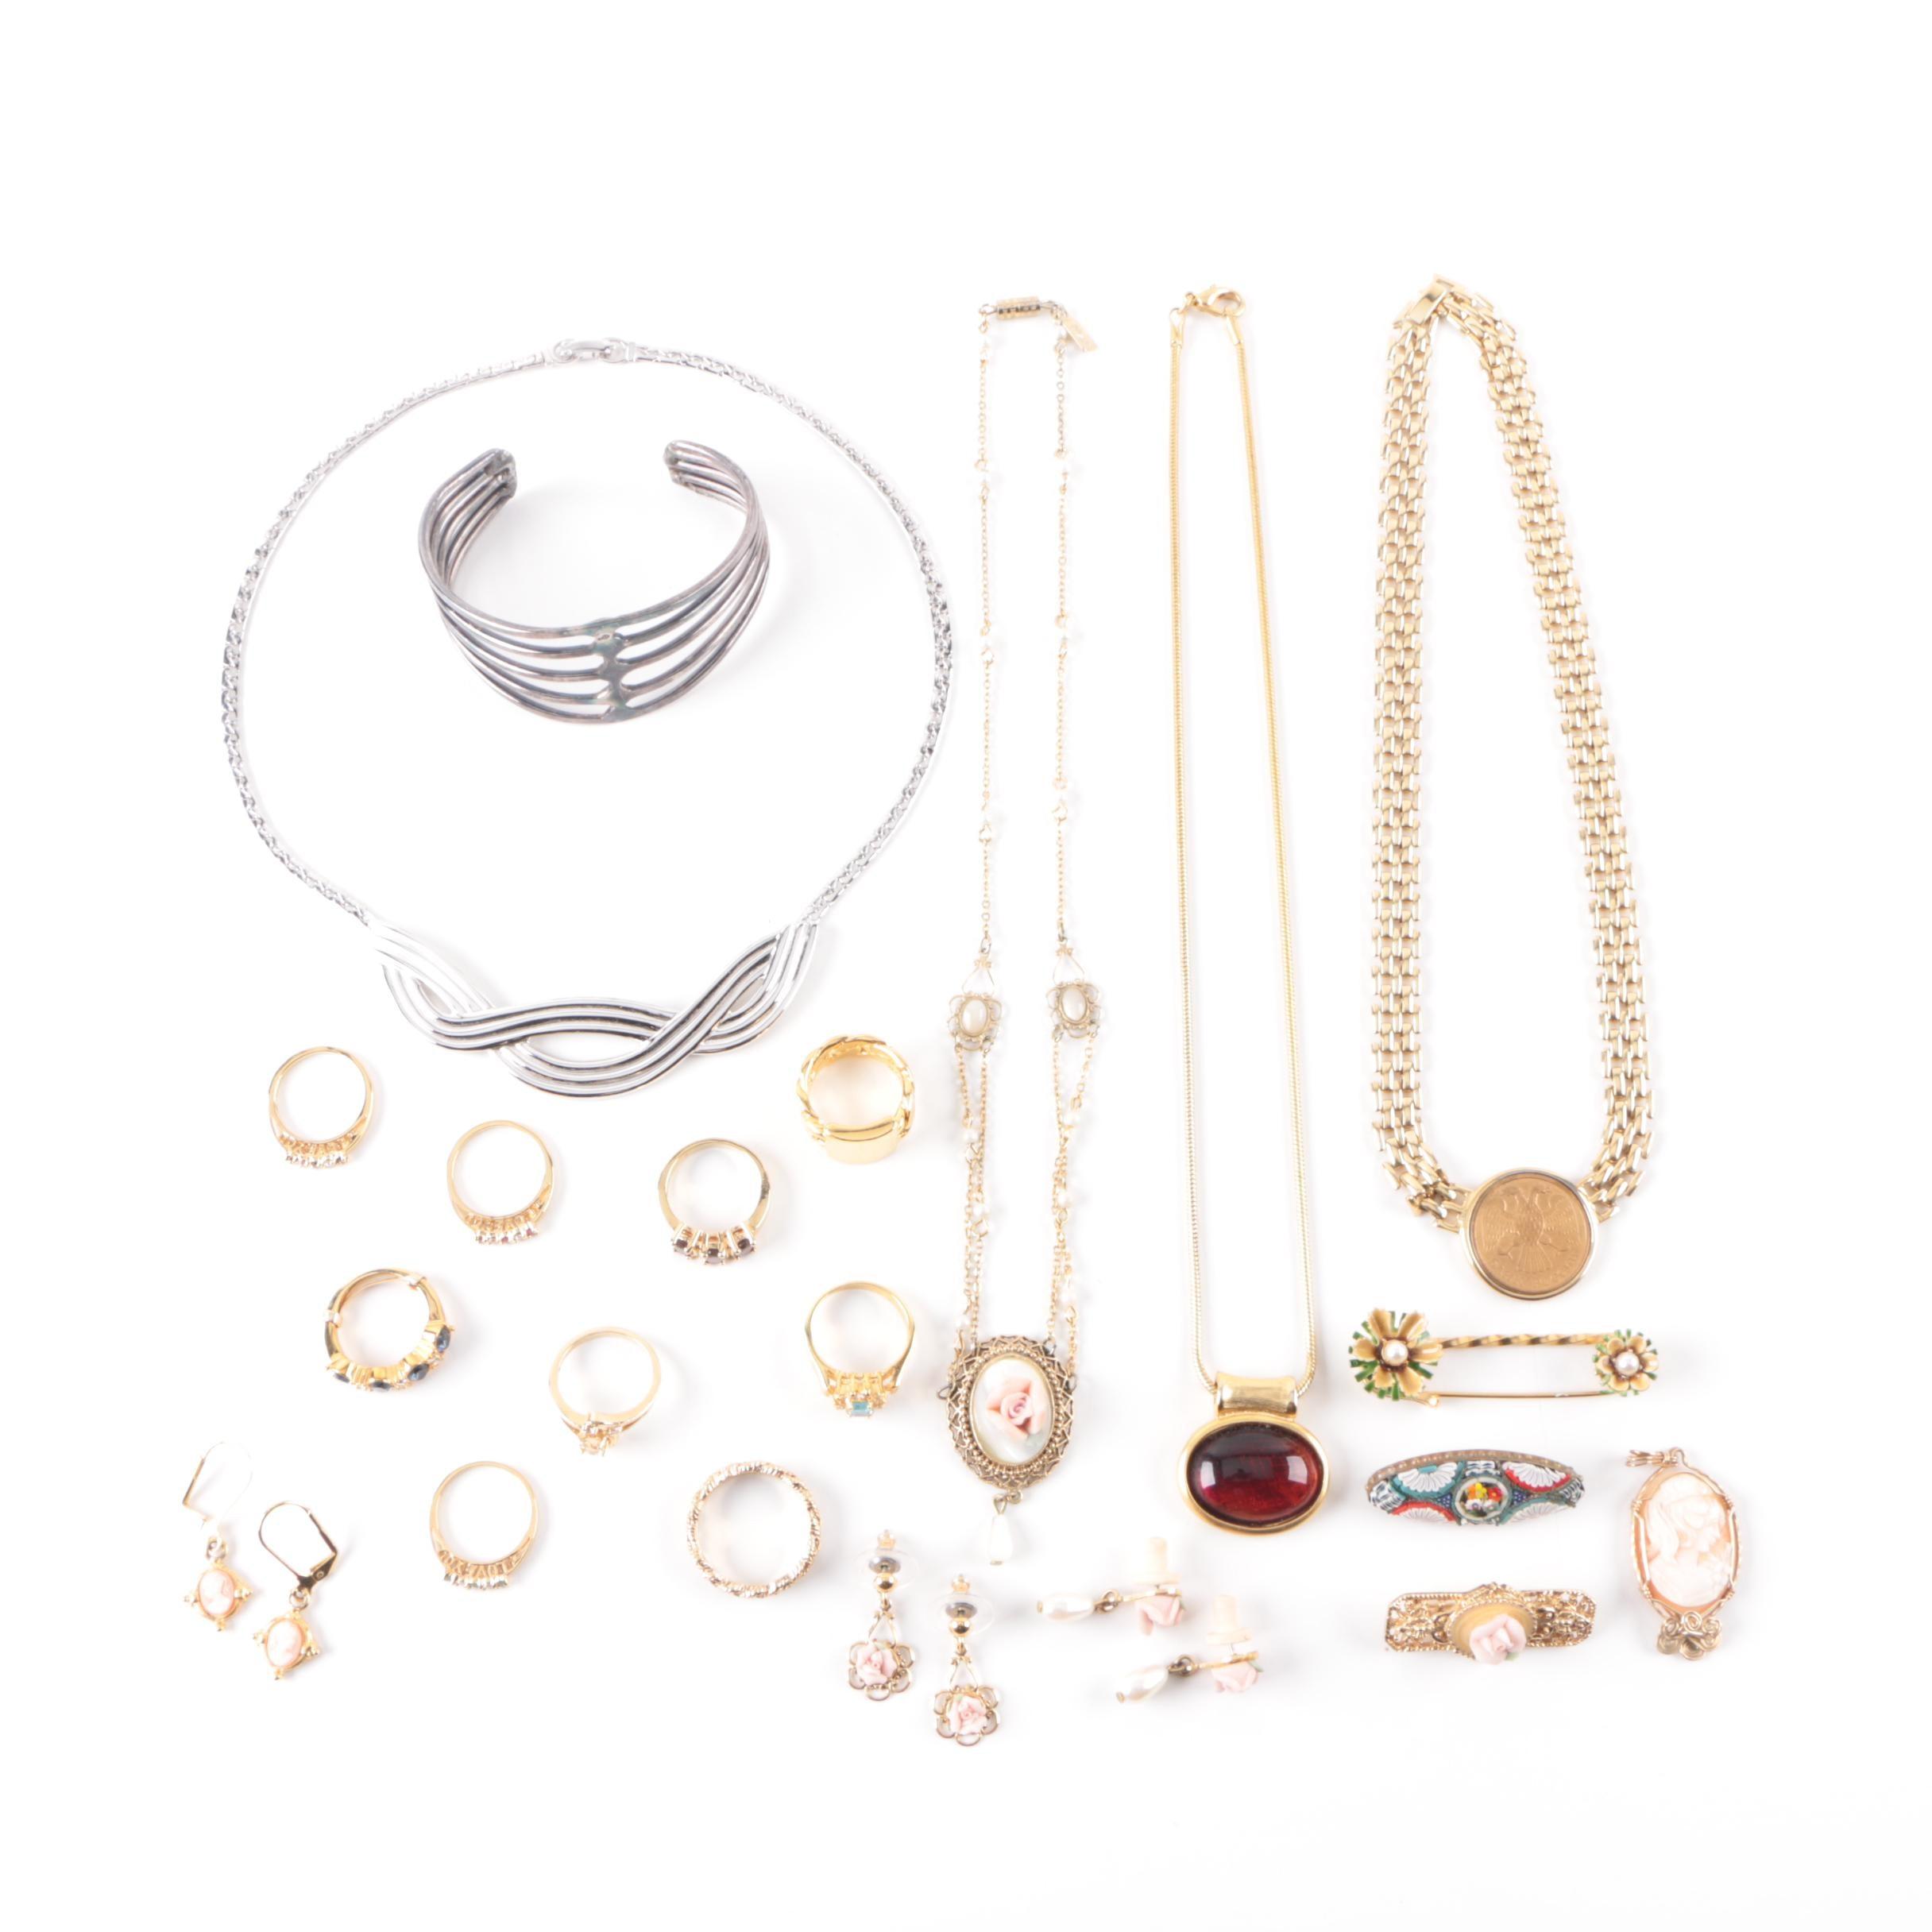 Grouping of Jewlery Including Gemstones